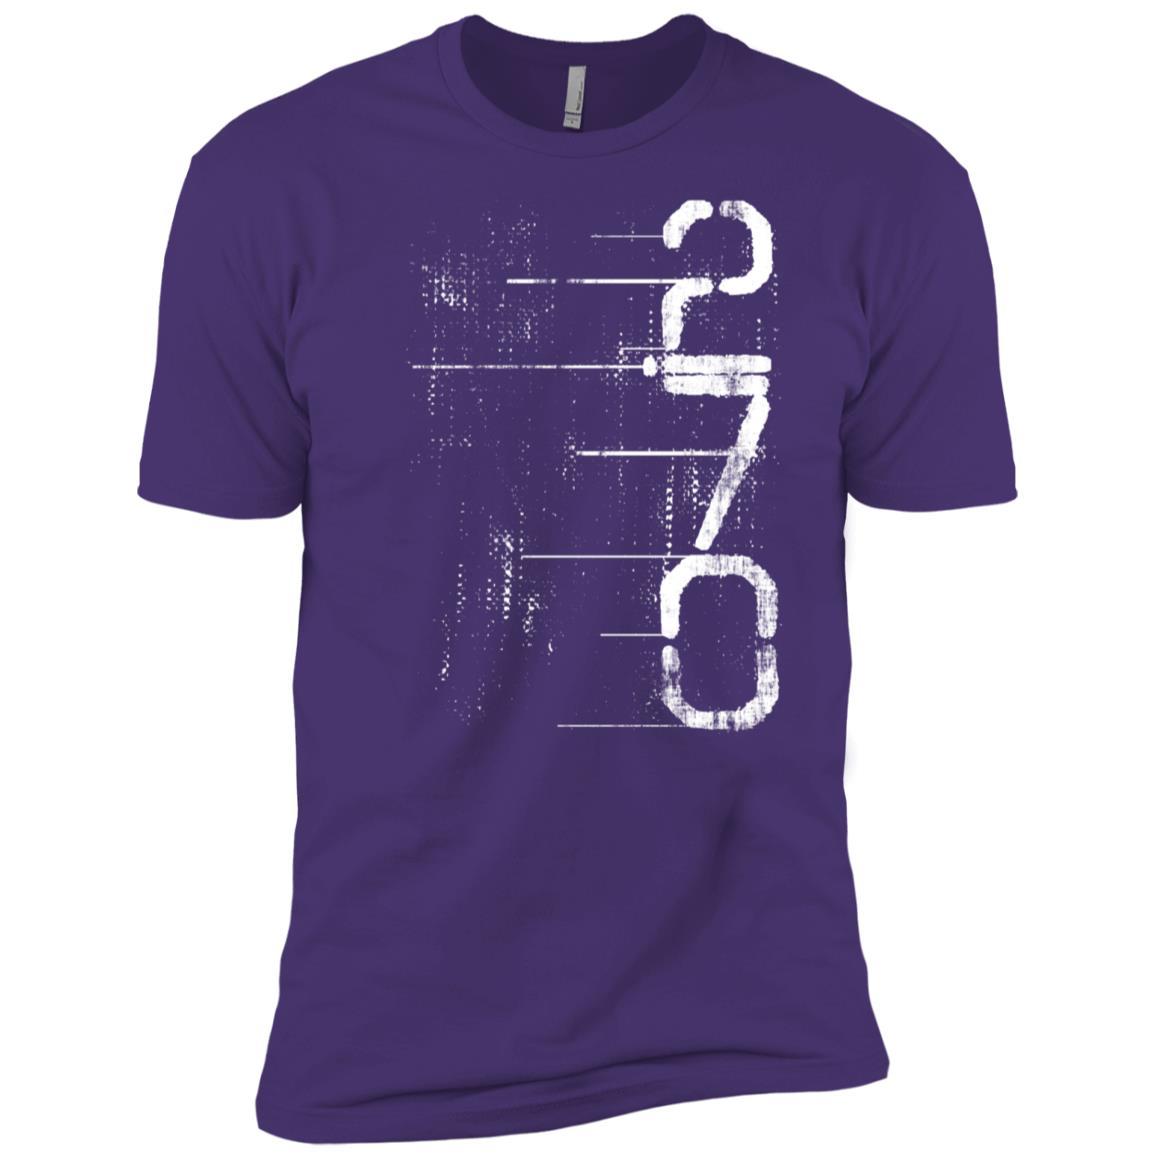 270 Ammo Shooting Firing Range Huntings Gun Lovers Tee Men Short Sleeve T-Shirt